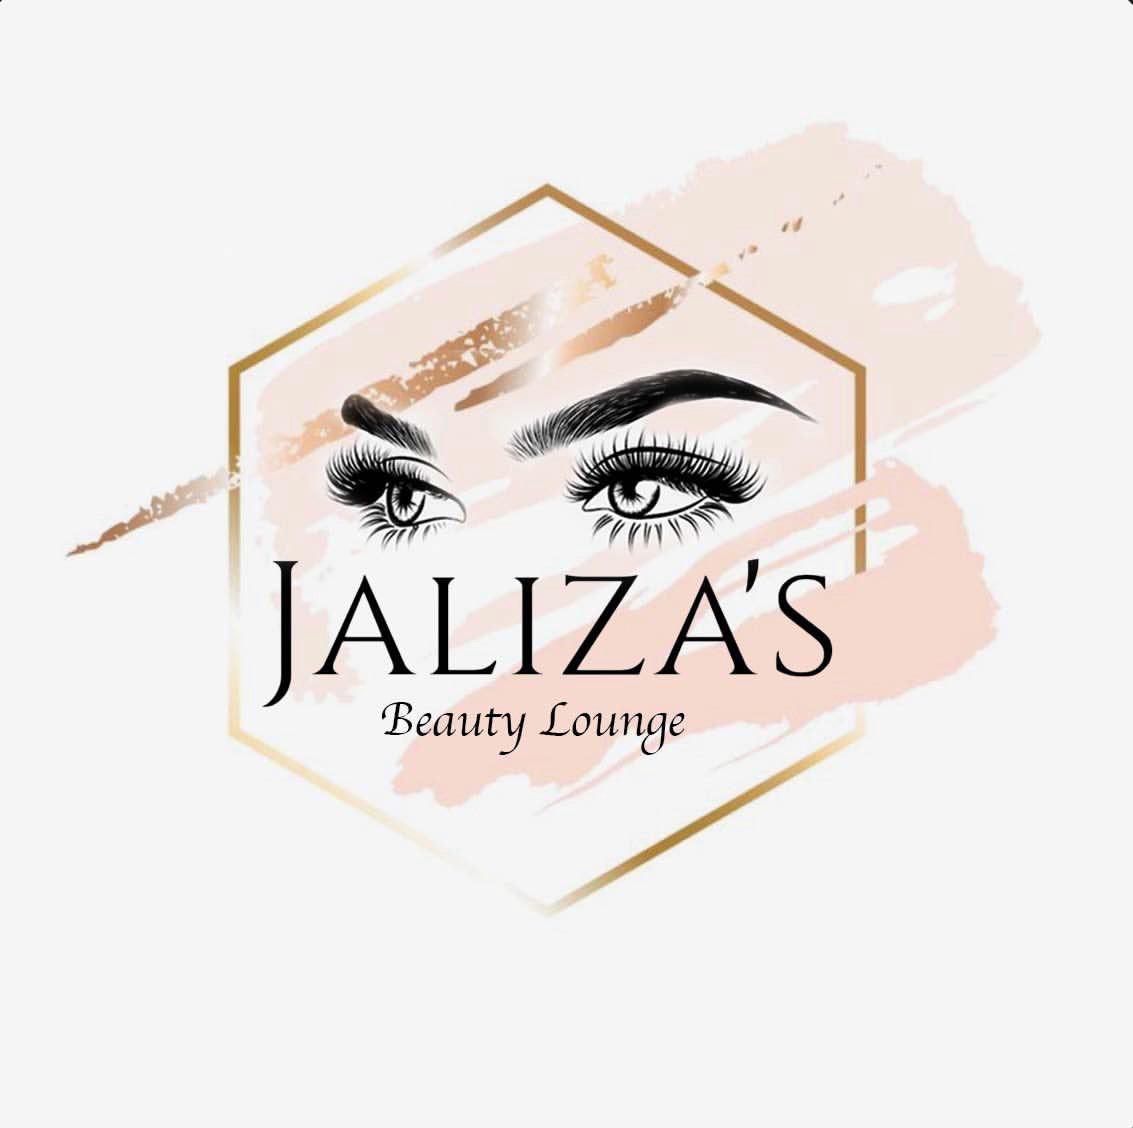 Jaliza's Beauty Lounge logo